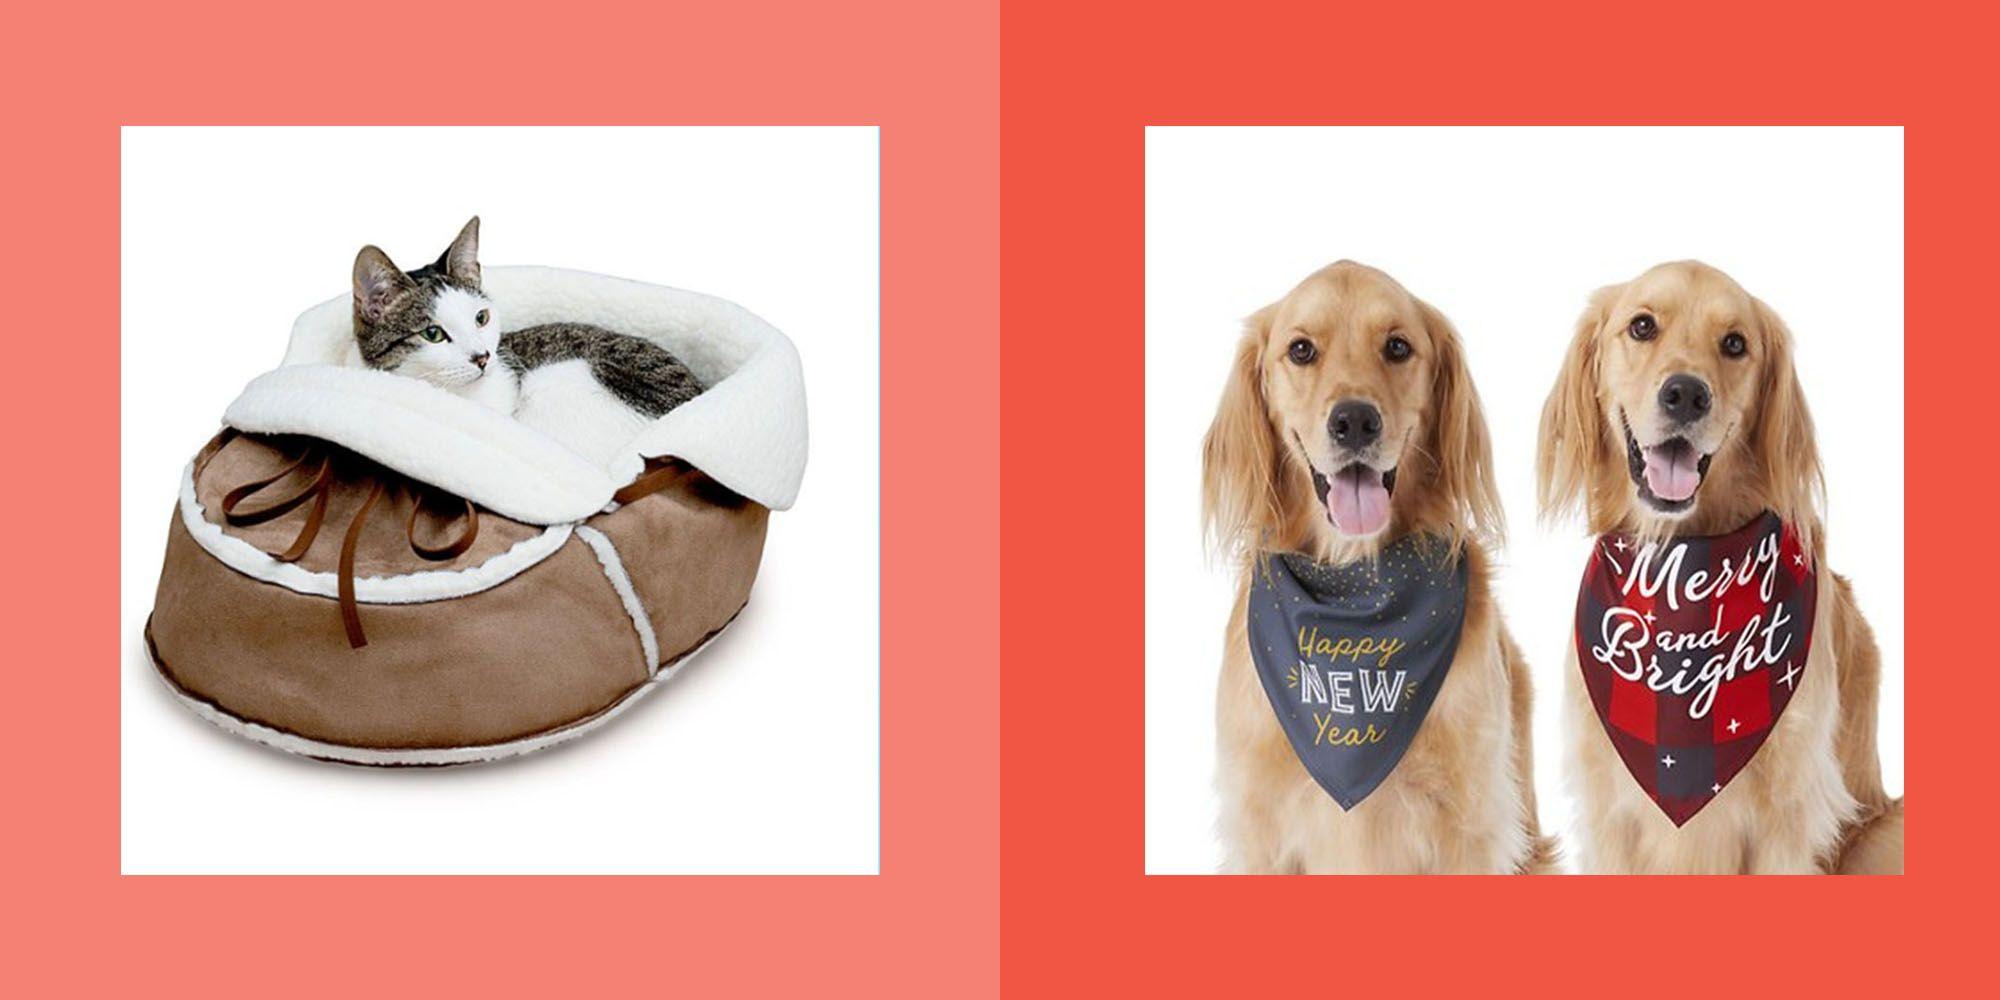 30 Pet Christmas Gifts 2019 \u2014 Best Dog,Cat, Bunny, Hamster